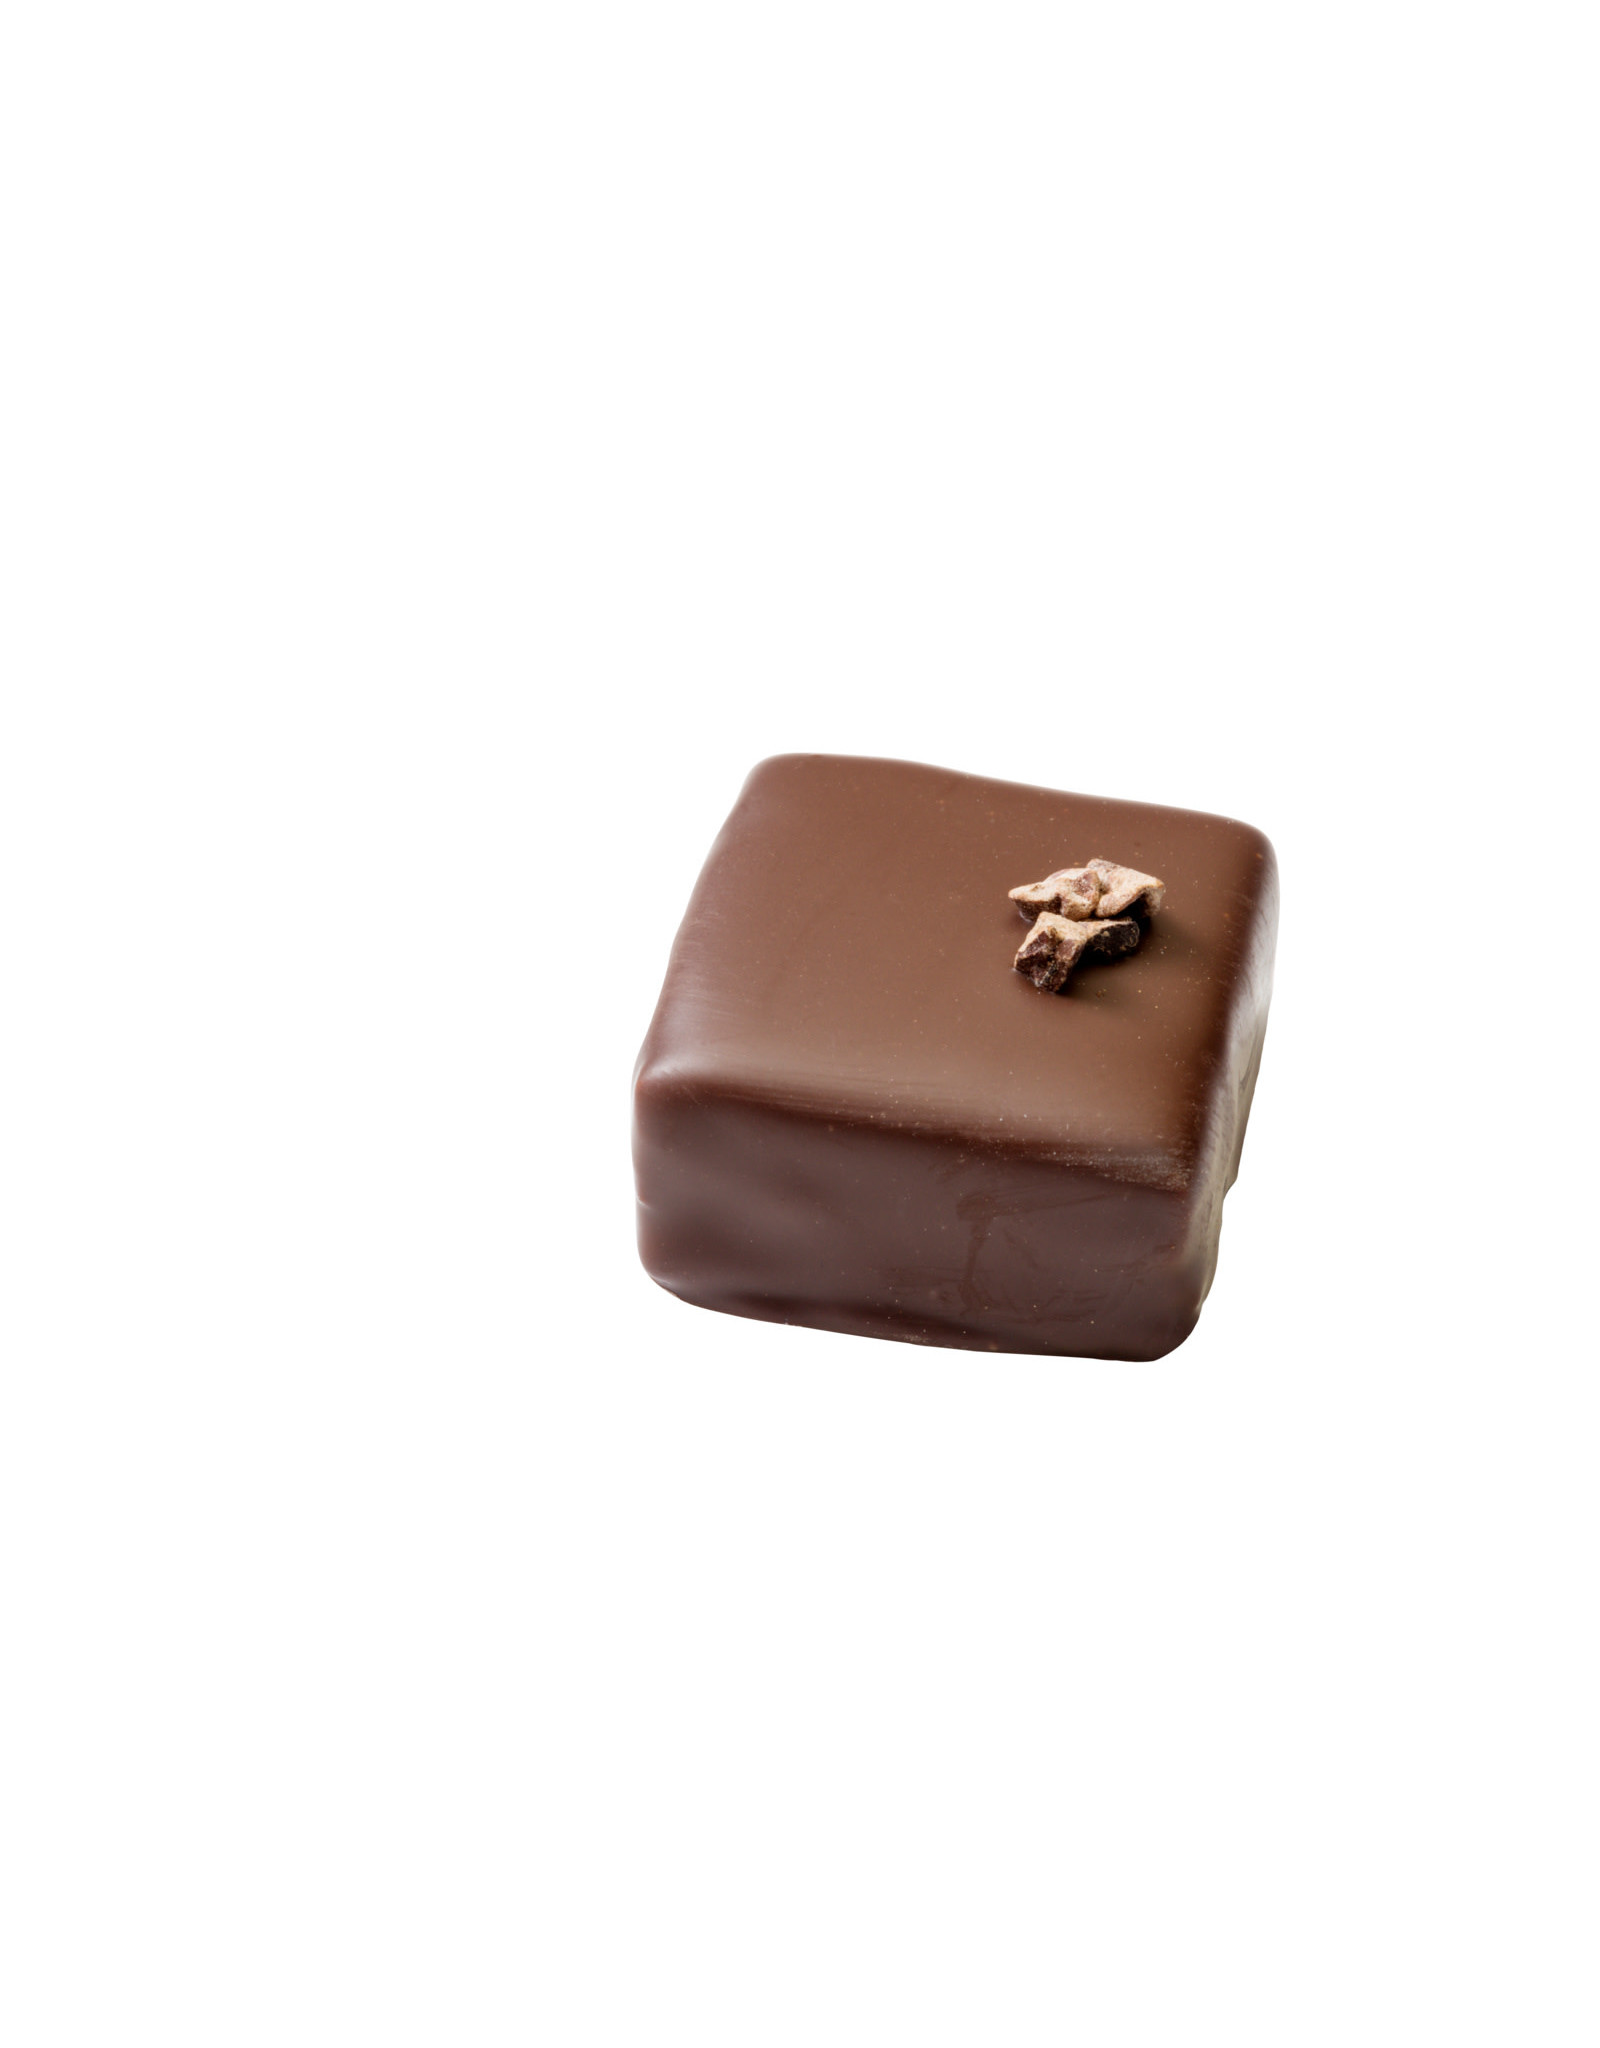 Visser Chocolade Cacaokern